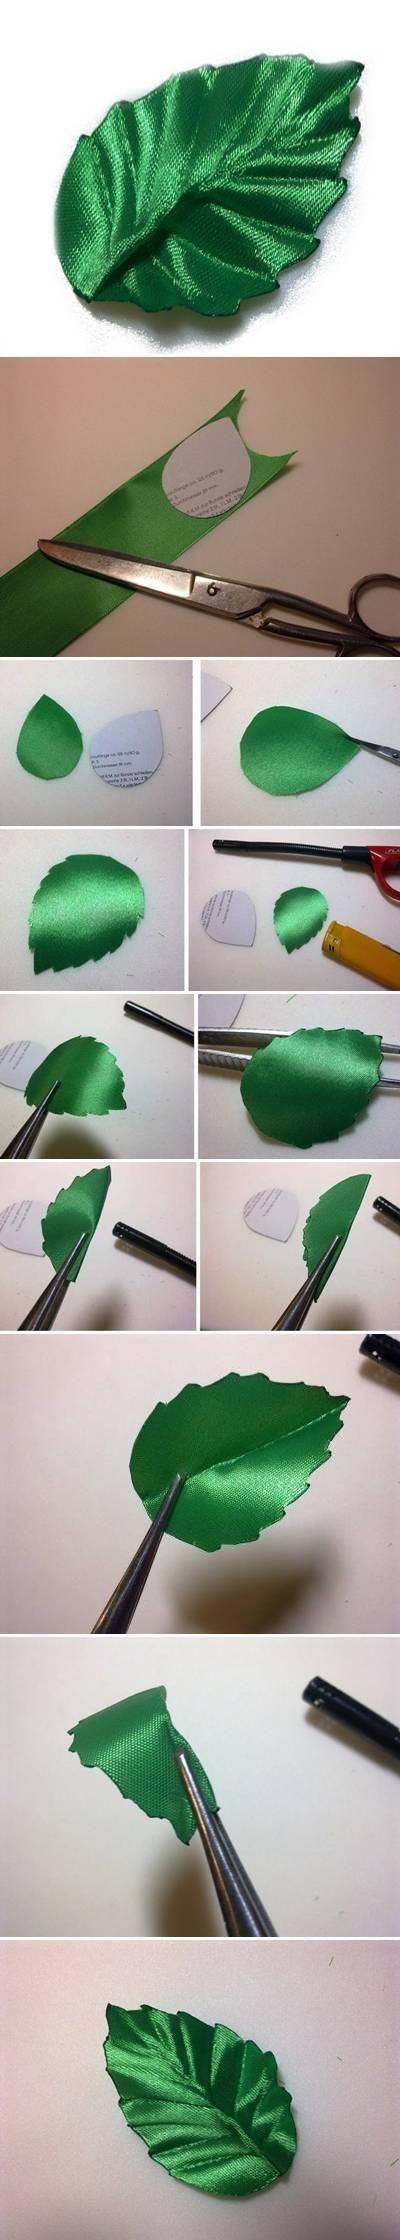 DIY Ribbon Crafts : DIY #RIbbonLeaf #phototutorial